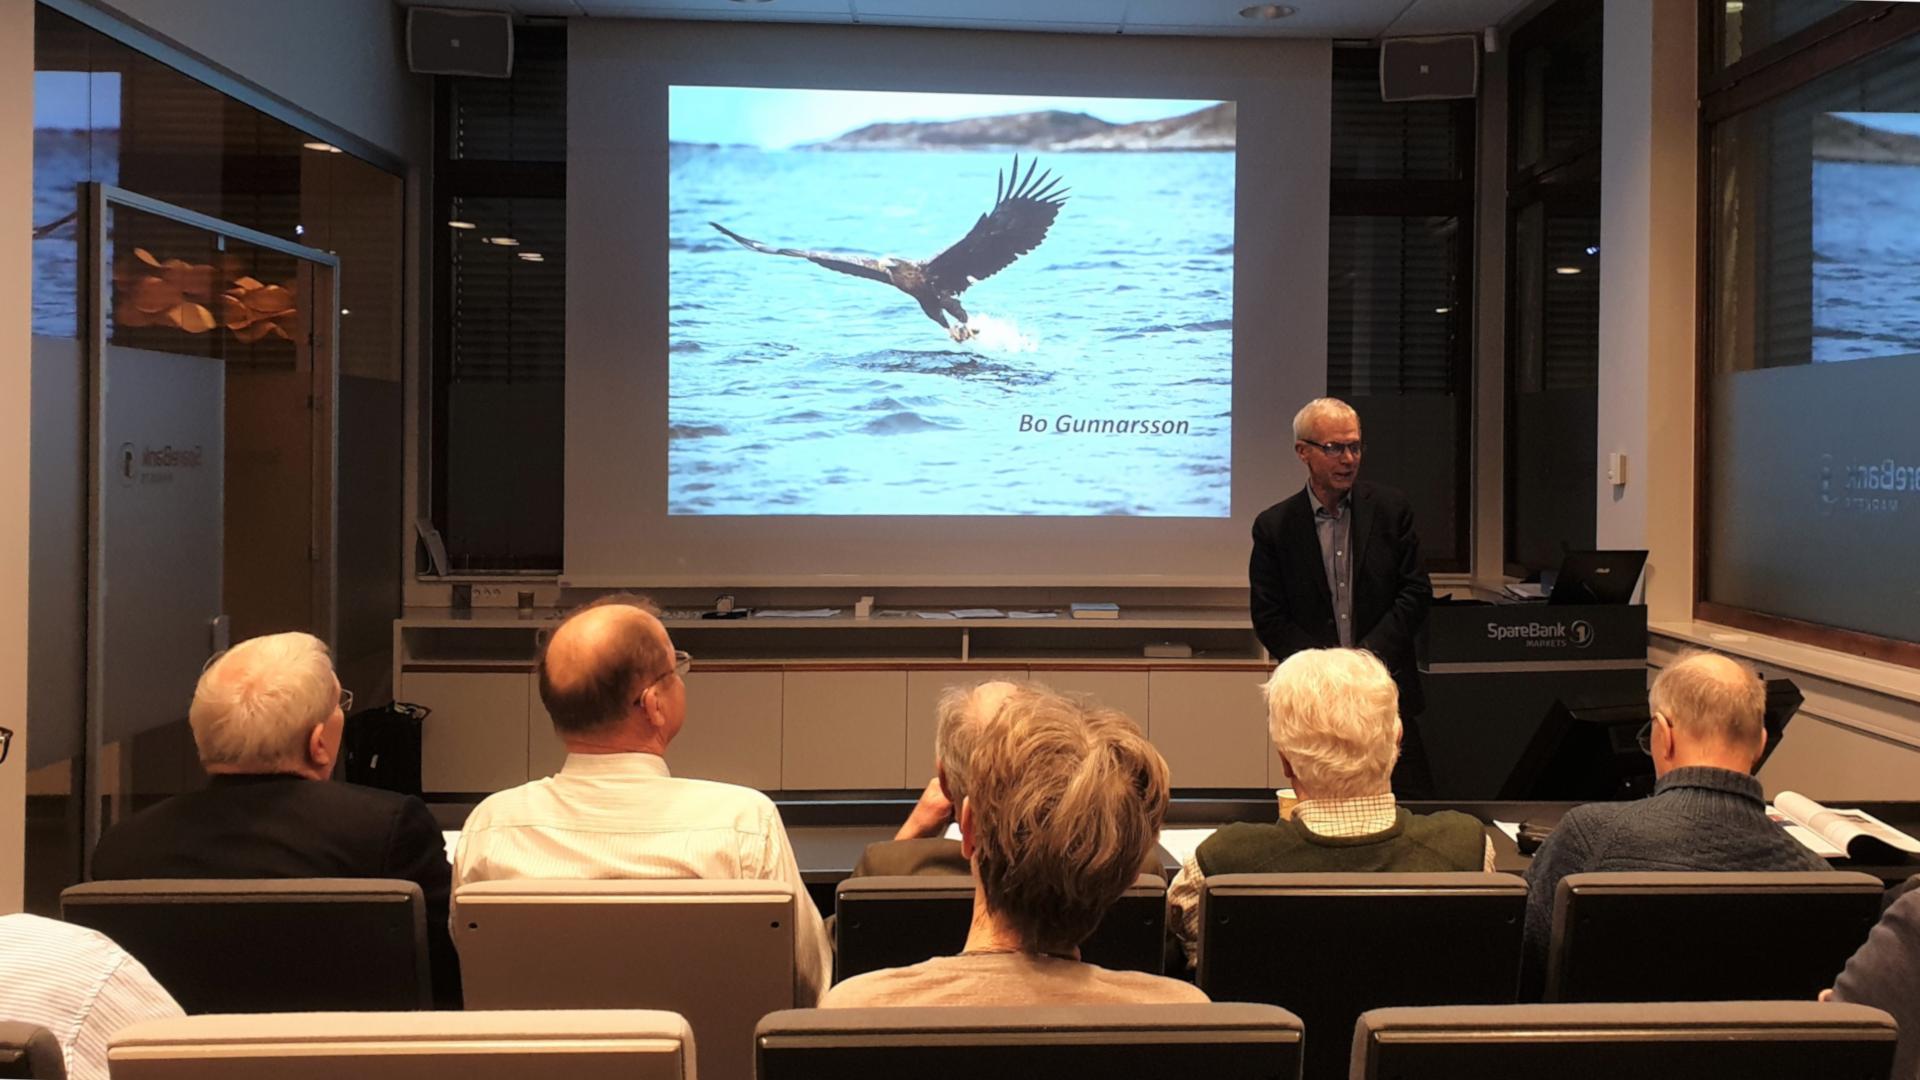 Bo Gunnarsson holdt et glimrende foredrag om myntsamling i Oslo